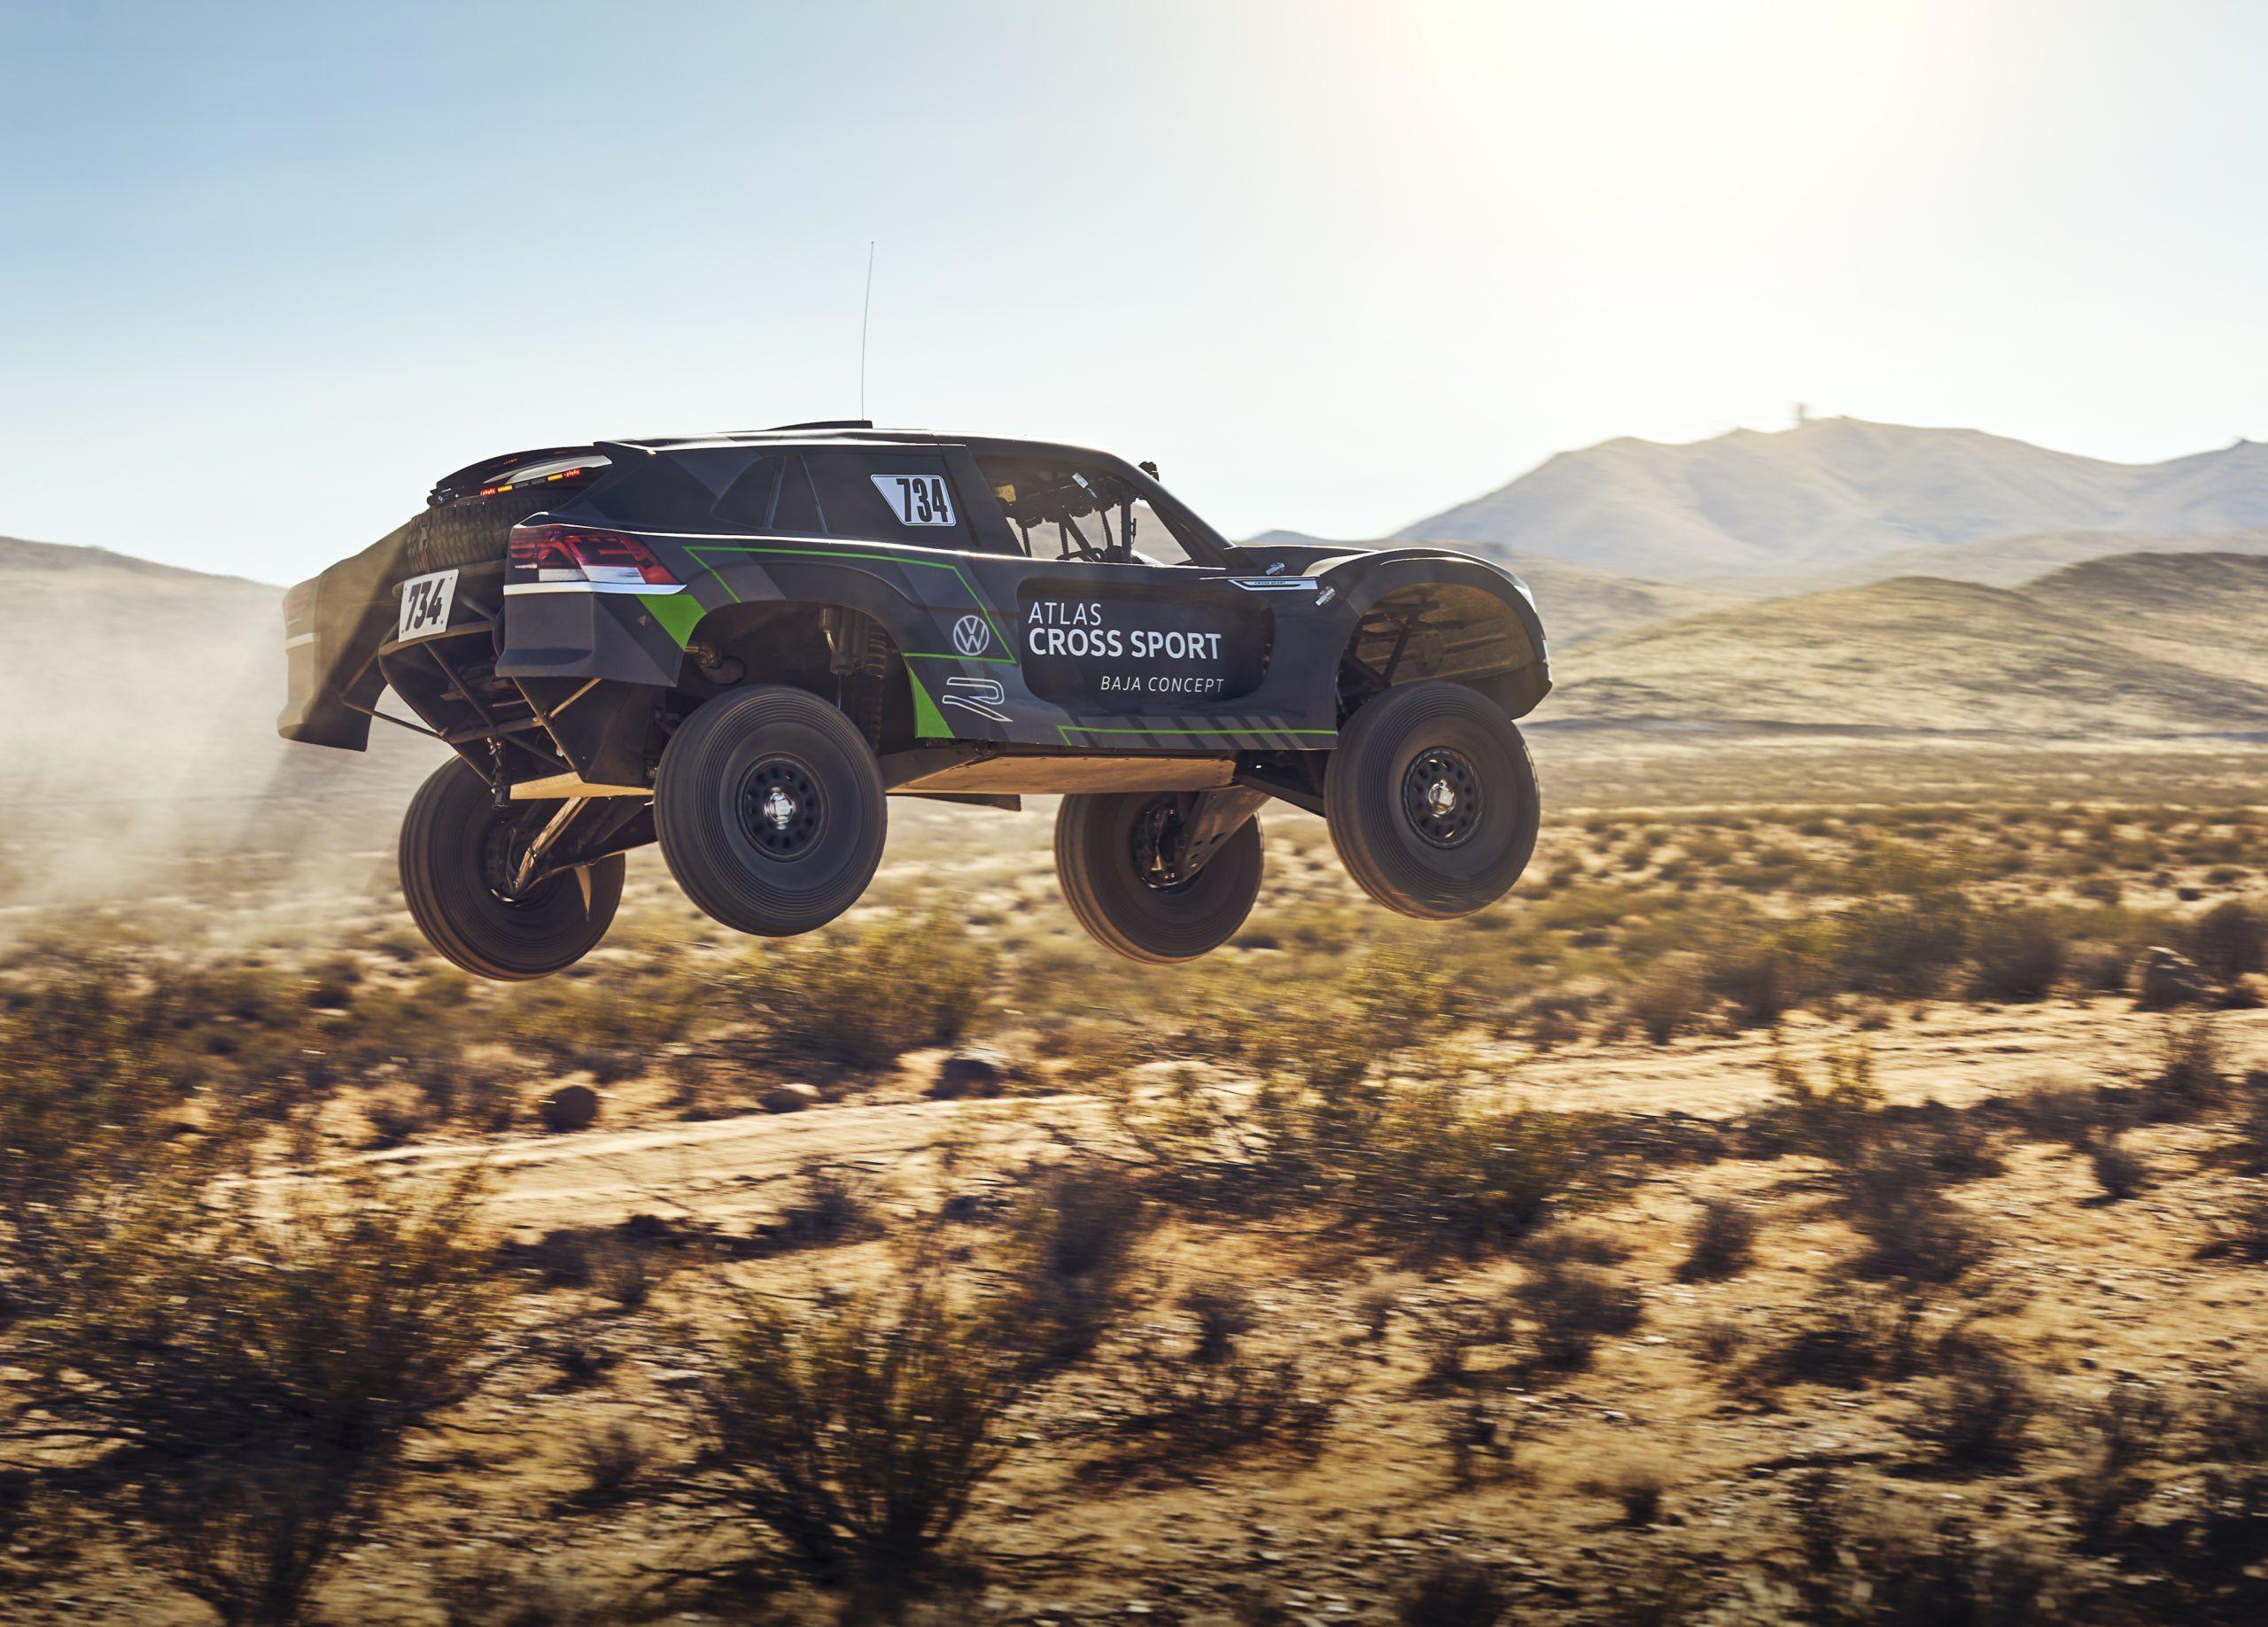 VW Atlas Cross Sport R debutará en la Baja 1000